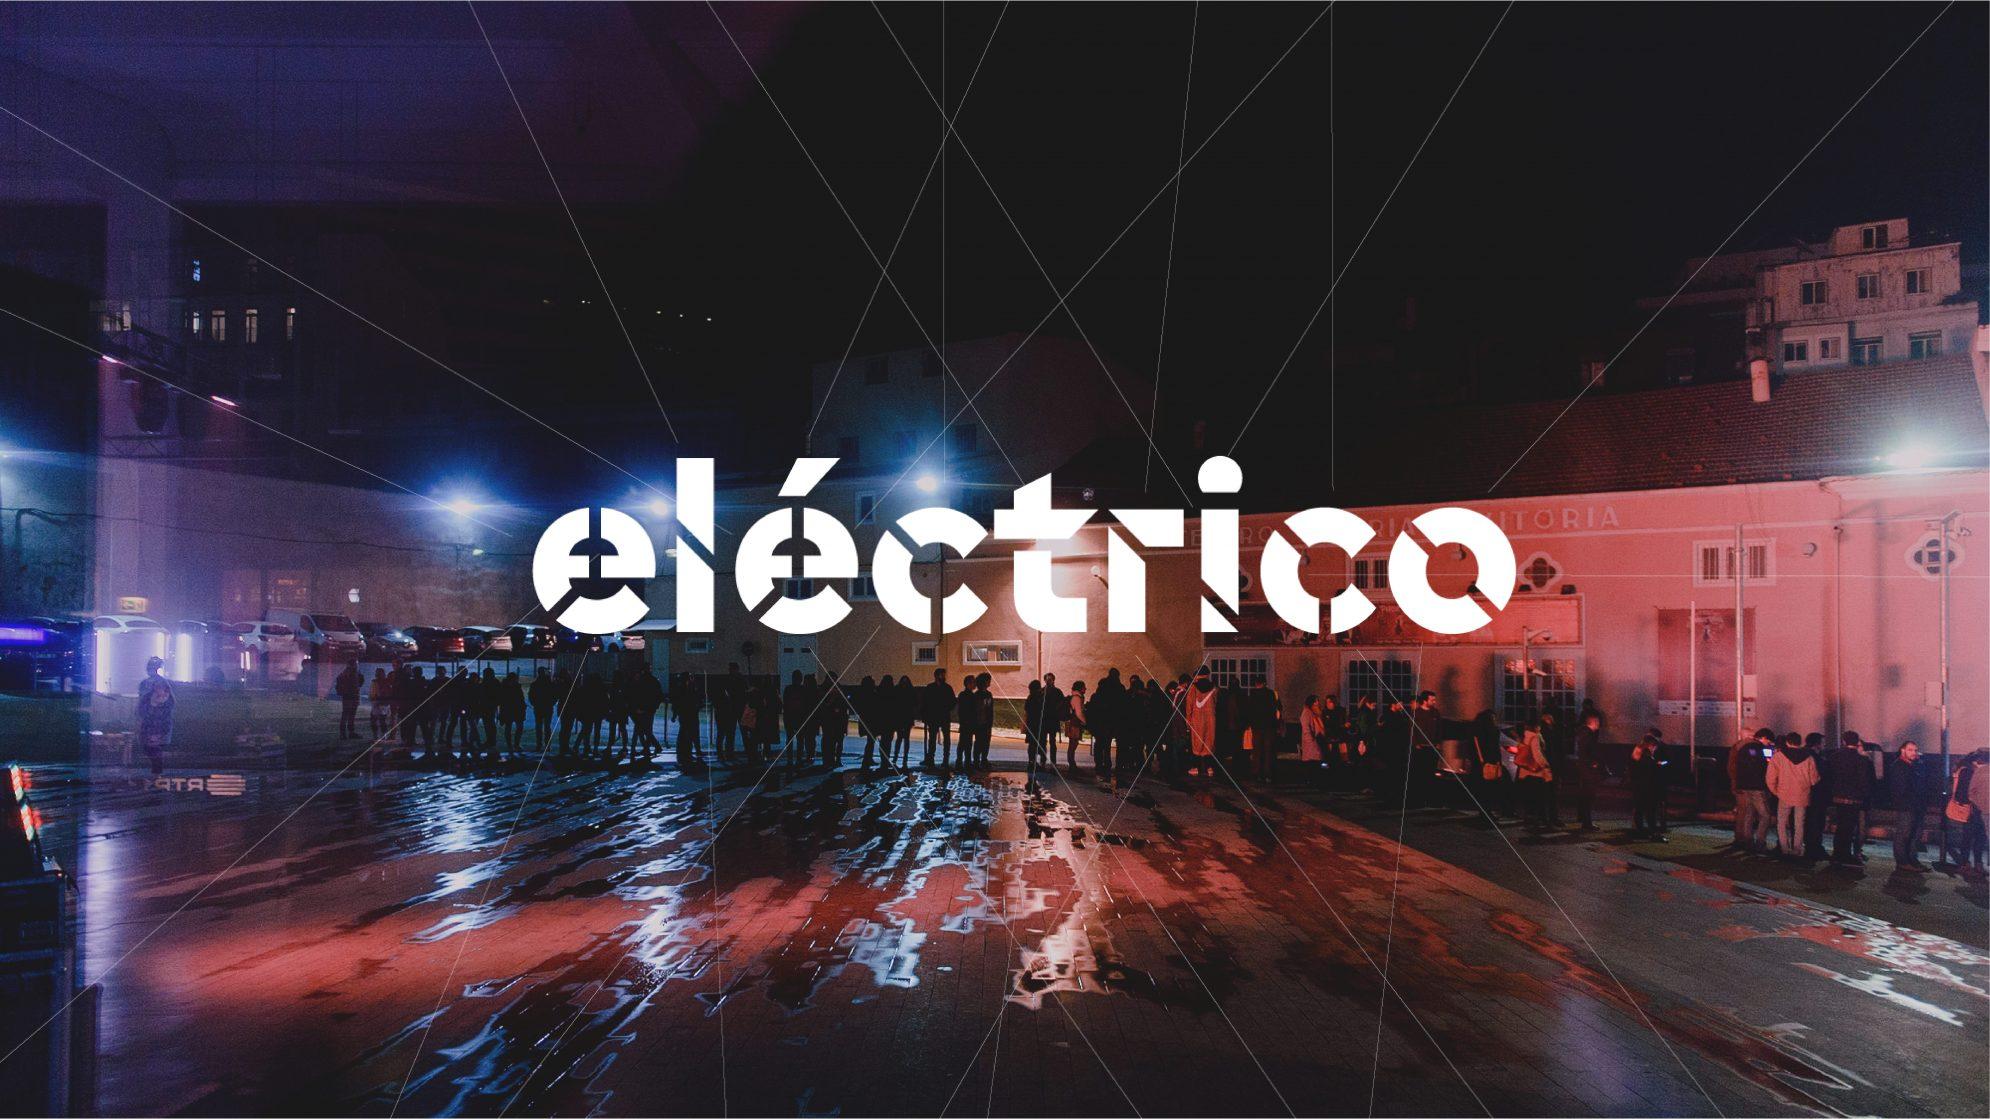 https://media.rtp.pt/antena3/wp-content/uploads/2019/08/IMAGEM_ELECTRICO.jpg